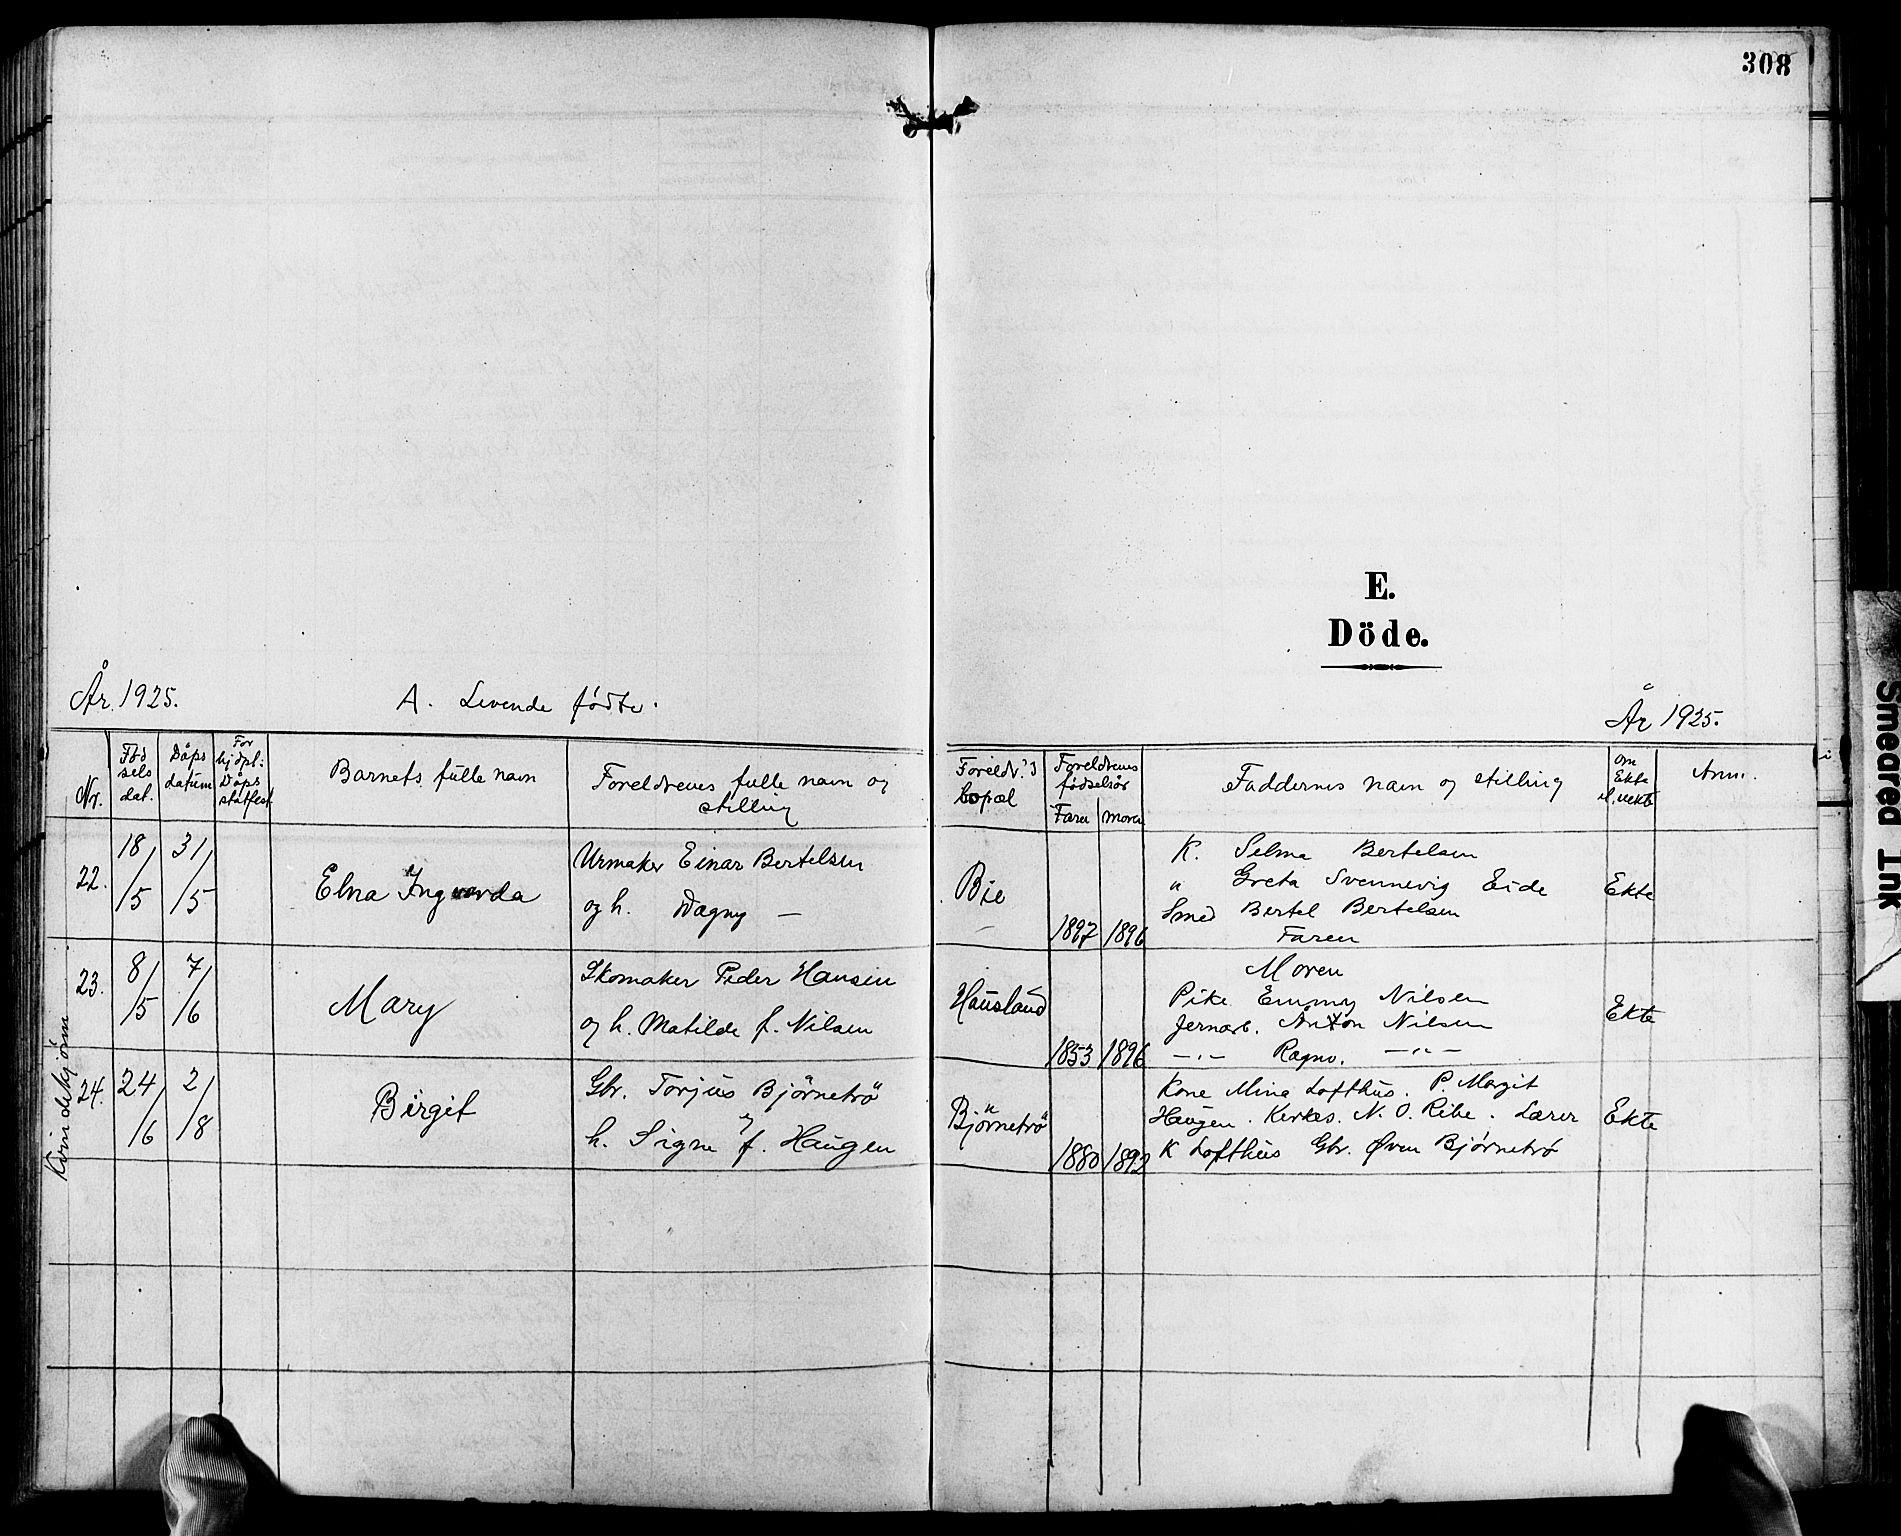 SAK, Fjære sokneprestkontor, F/Fb/L0012: Klokkerbok nr. B 12, 1902-1925, s. 308